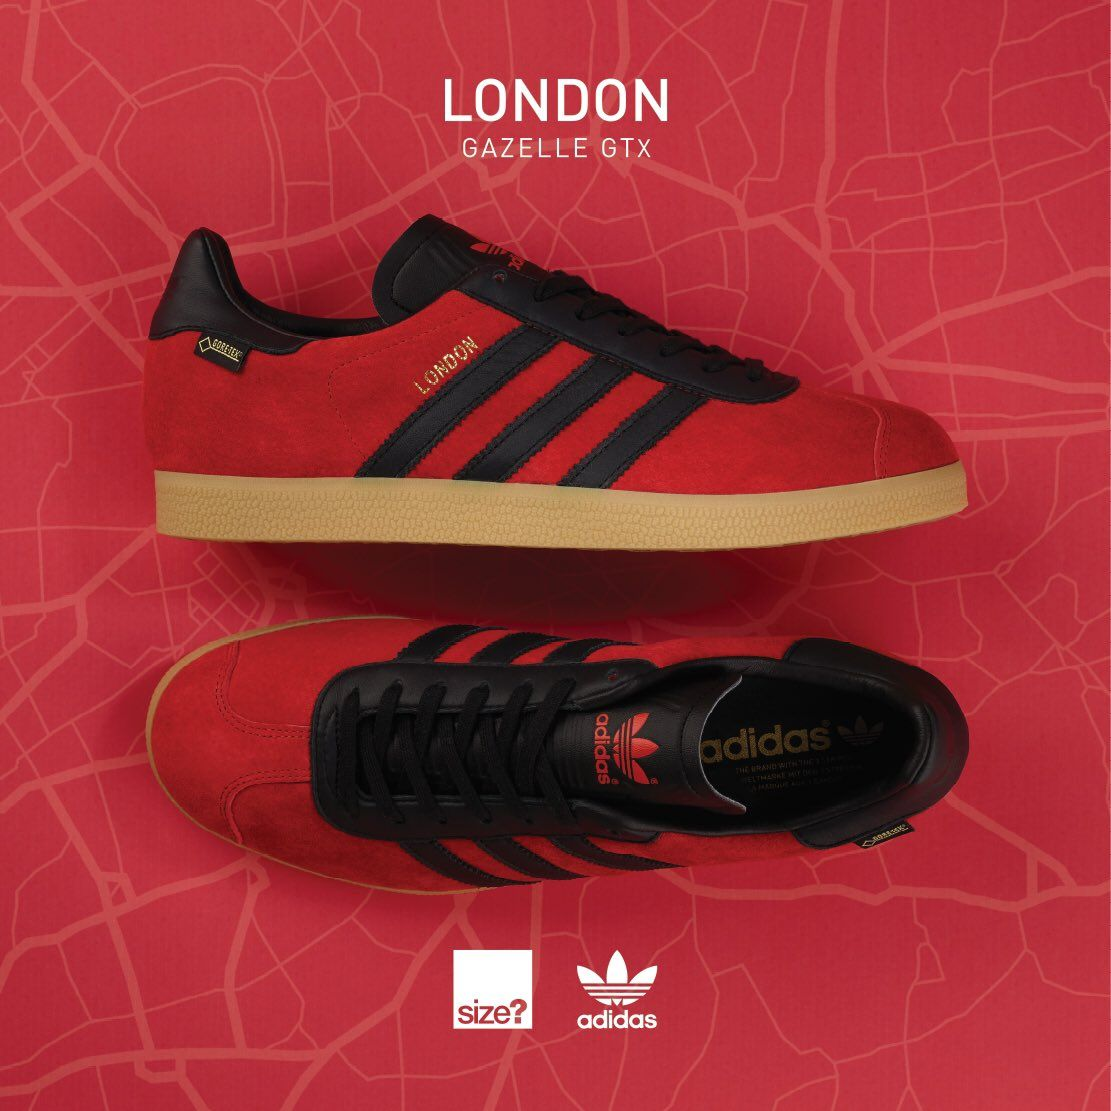 size? on | Adidas trainers mens, Adidas fashion, Adidas shoes